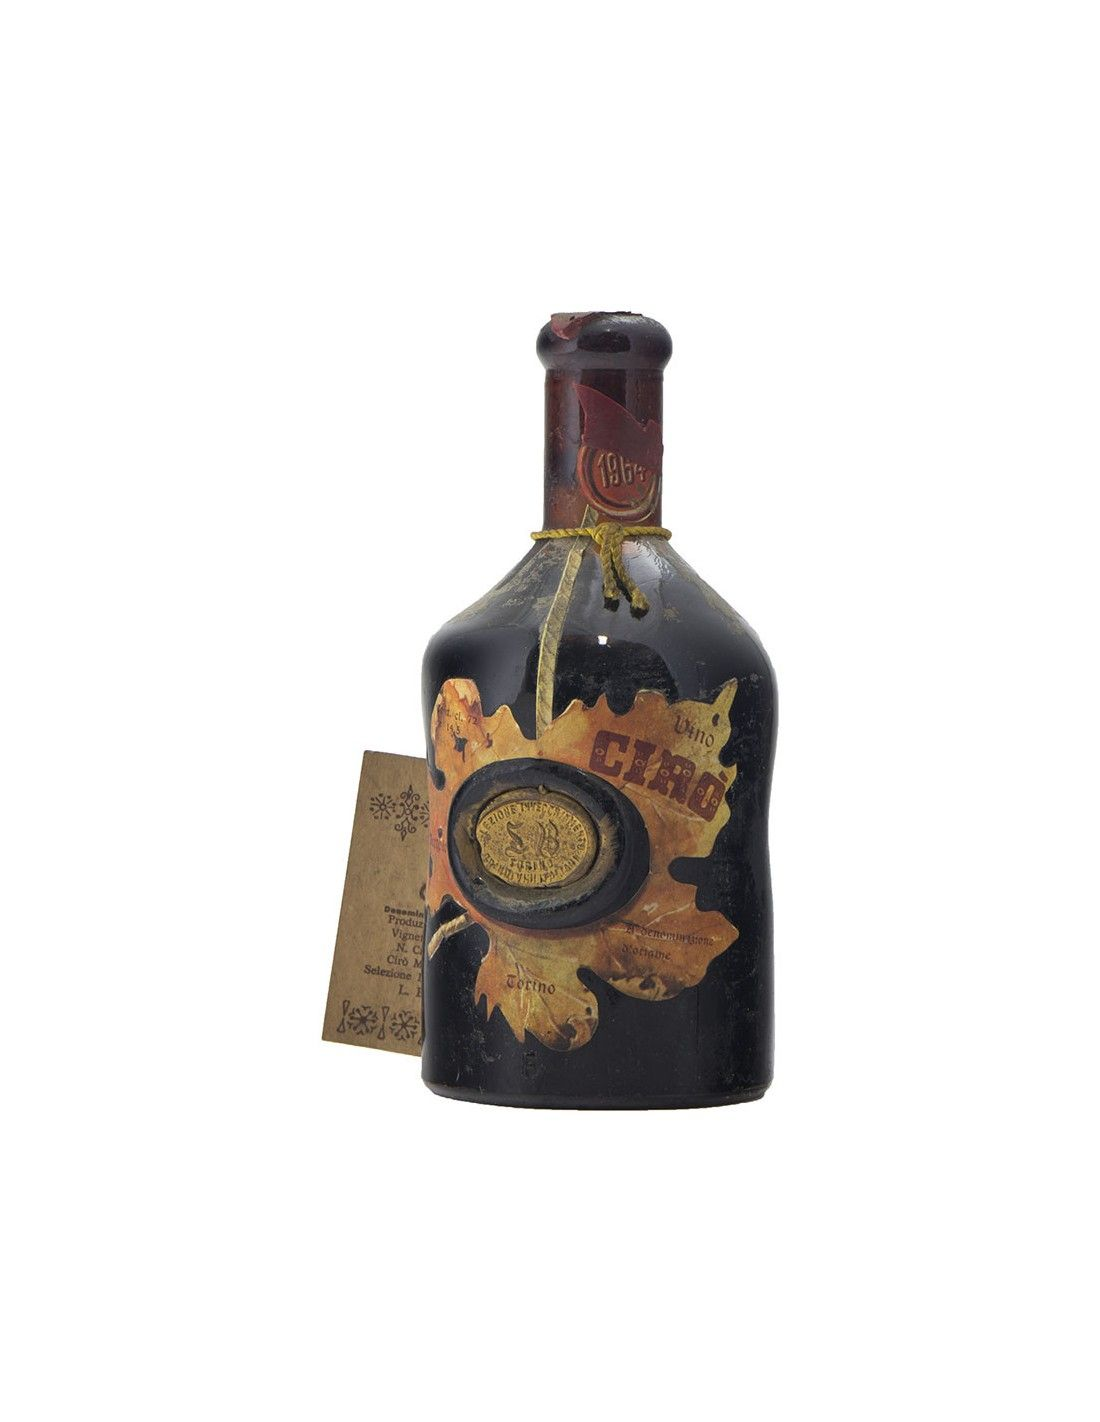 CIRO 1964 BERTOLO Grandi Bottiglie